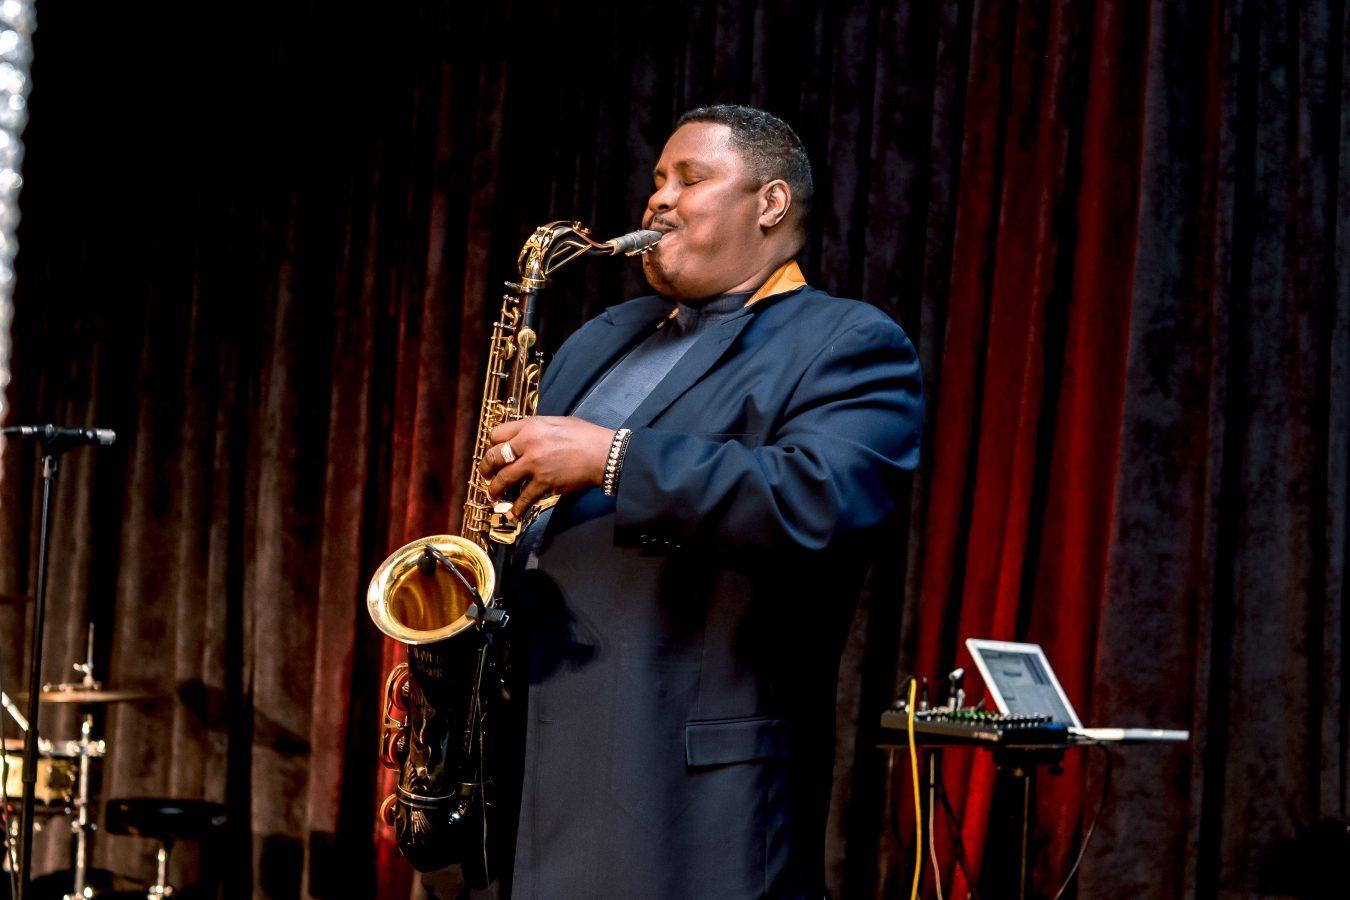 View More: https://monicablackshire.pass.us/delta-sigma-theta-jazz-soiree-2019